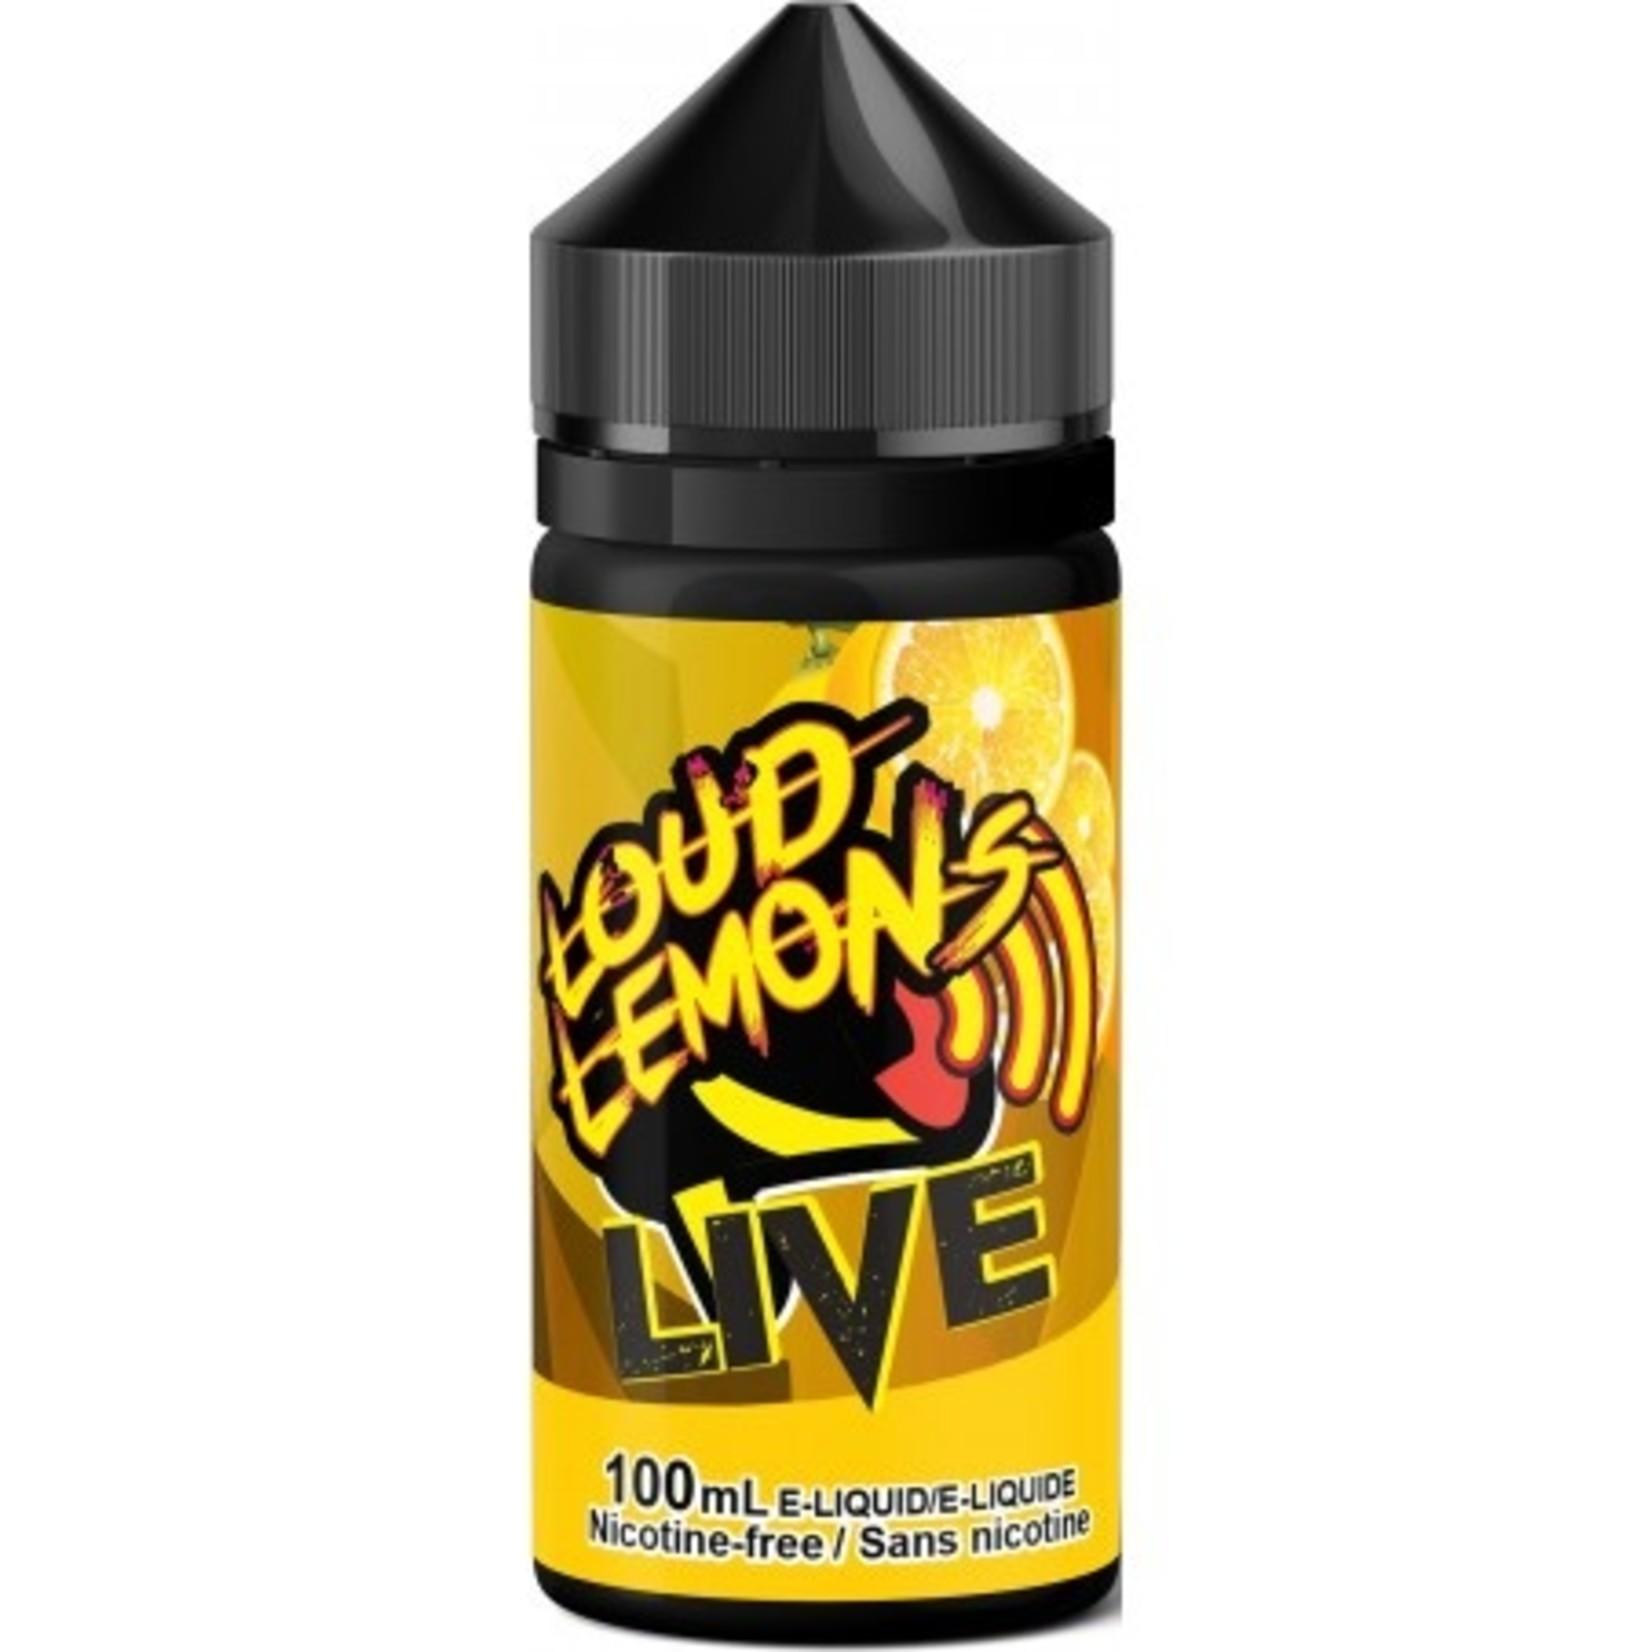 Loud Lemons Live